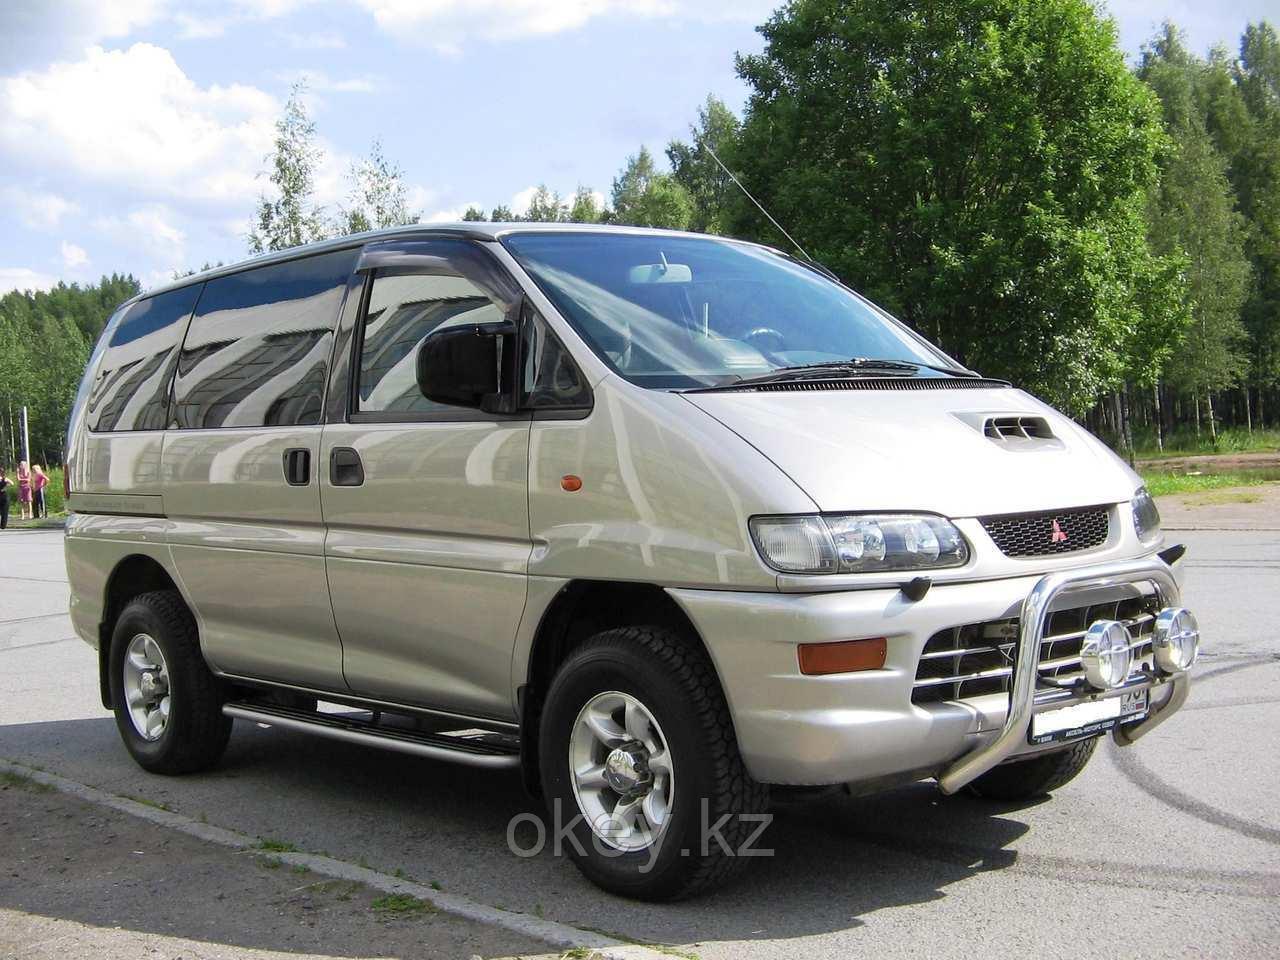 Тормозные колодки Kötl 3200KT для Mitsubishi L400/Space Gear автобус (PD_W, PC_W, PA_V, PB_V, PA_W) 2500 TD,